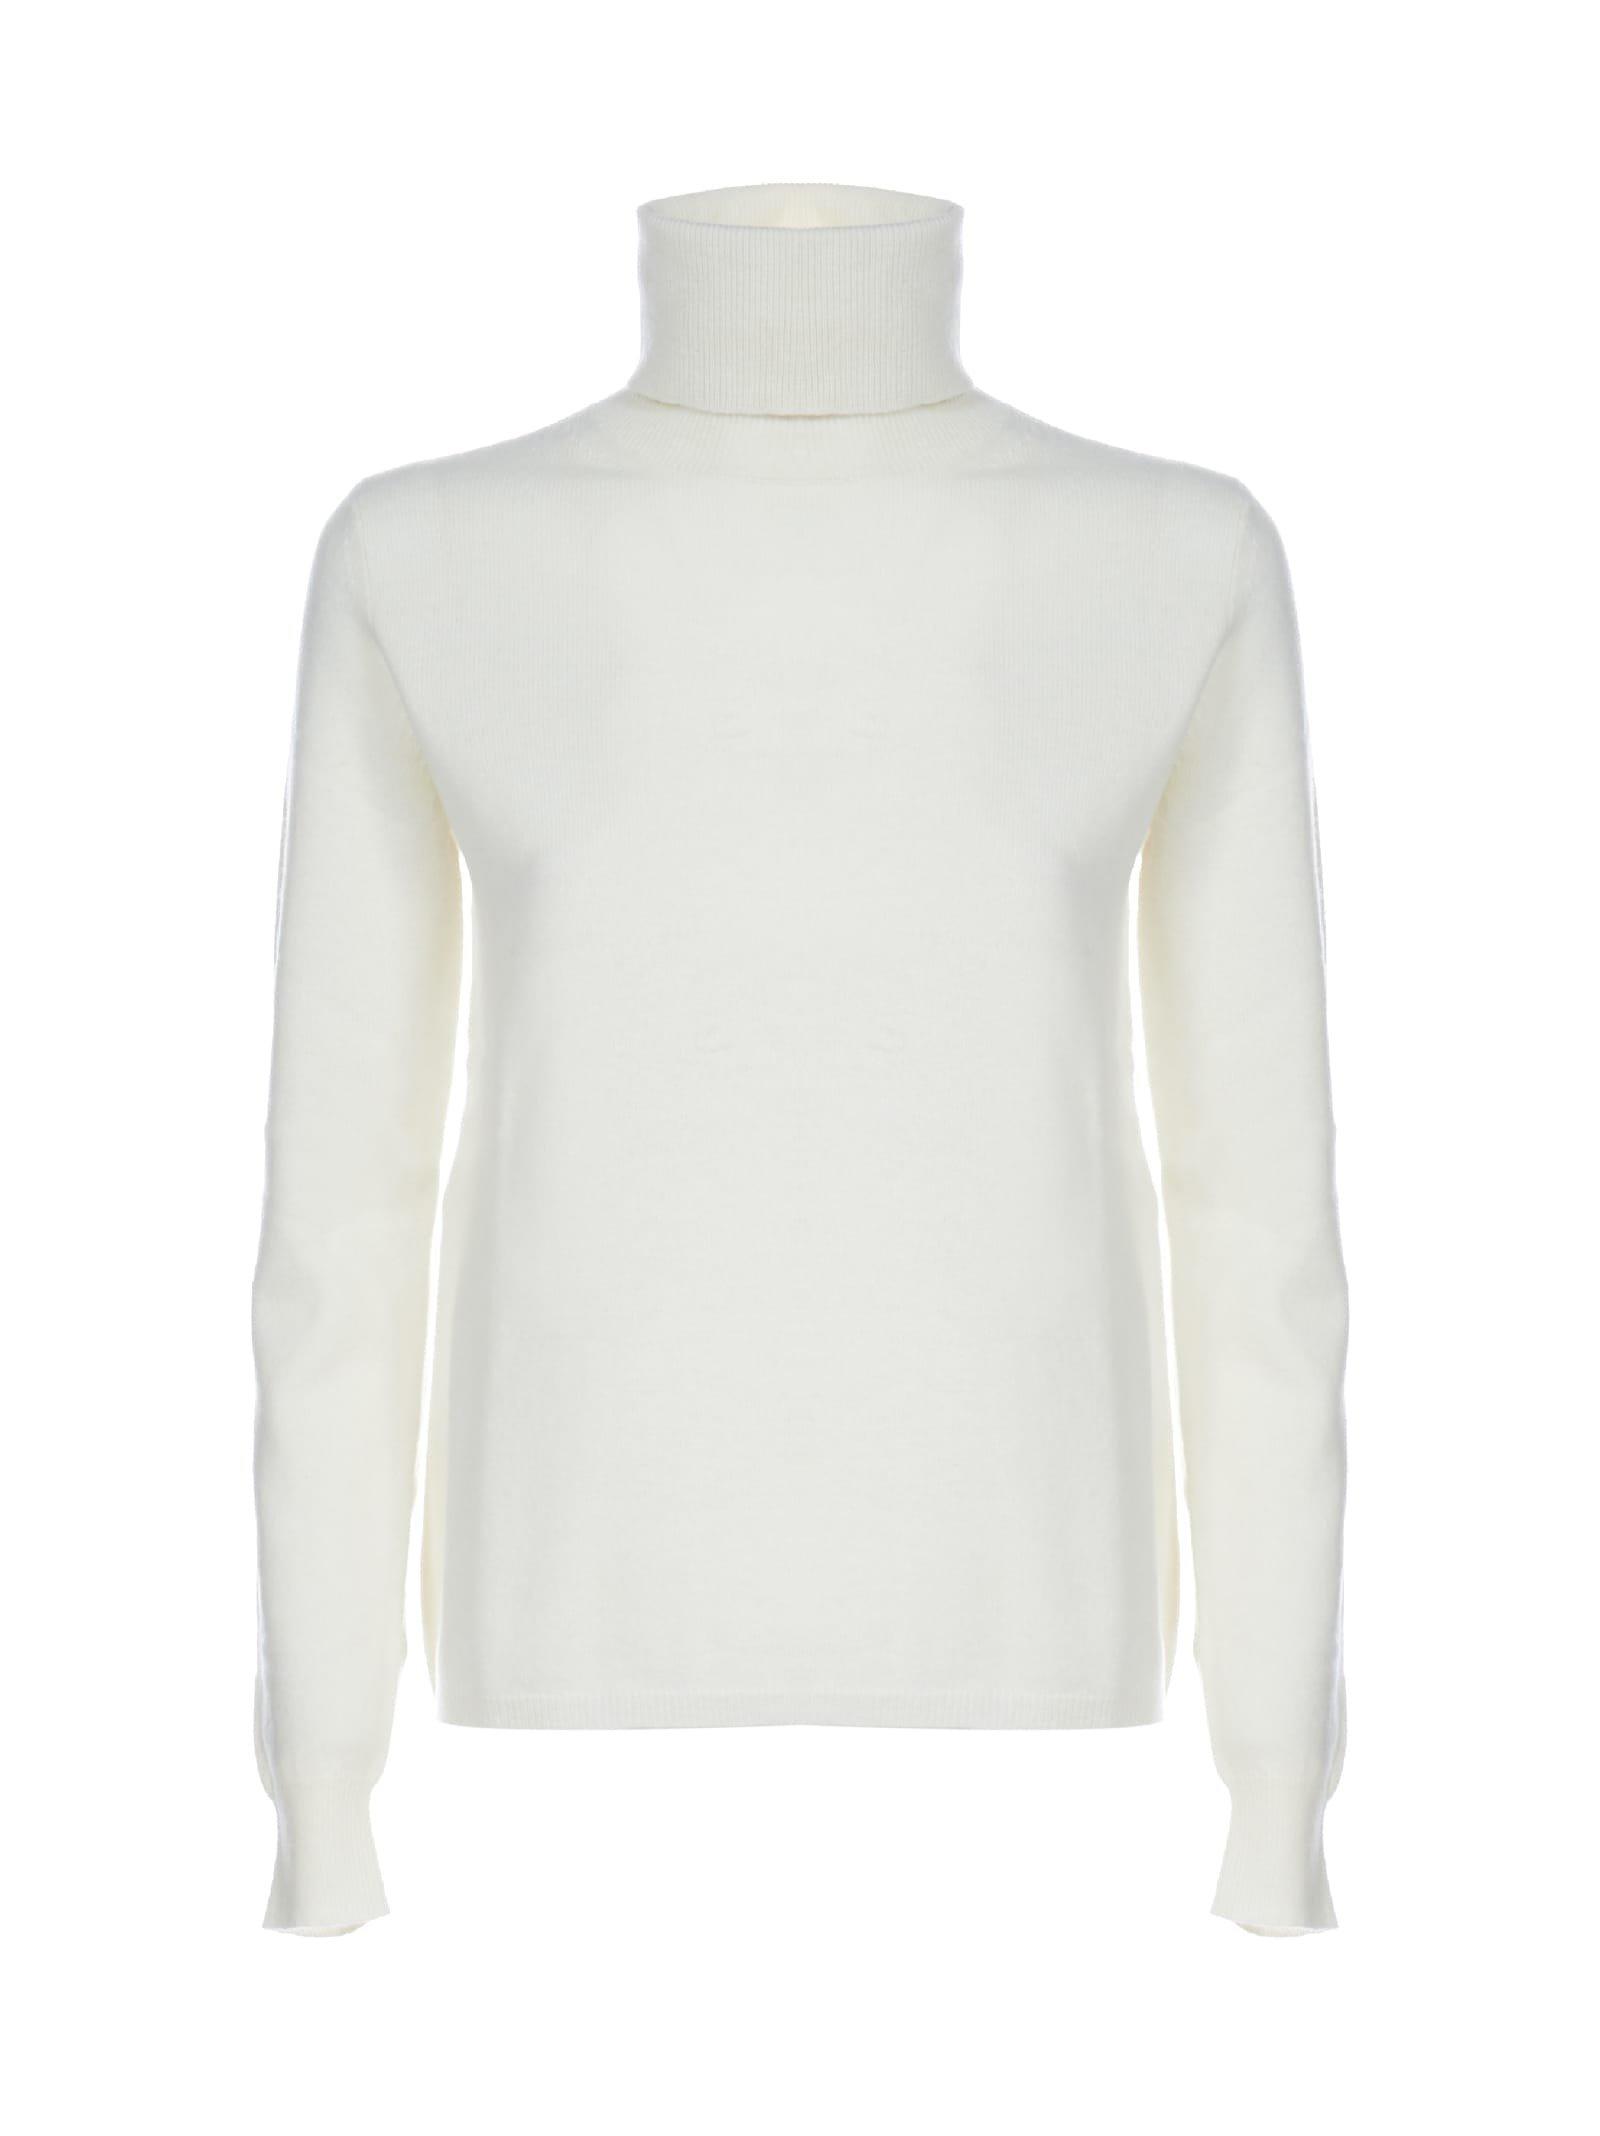 Max Mara Studio Sweater